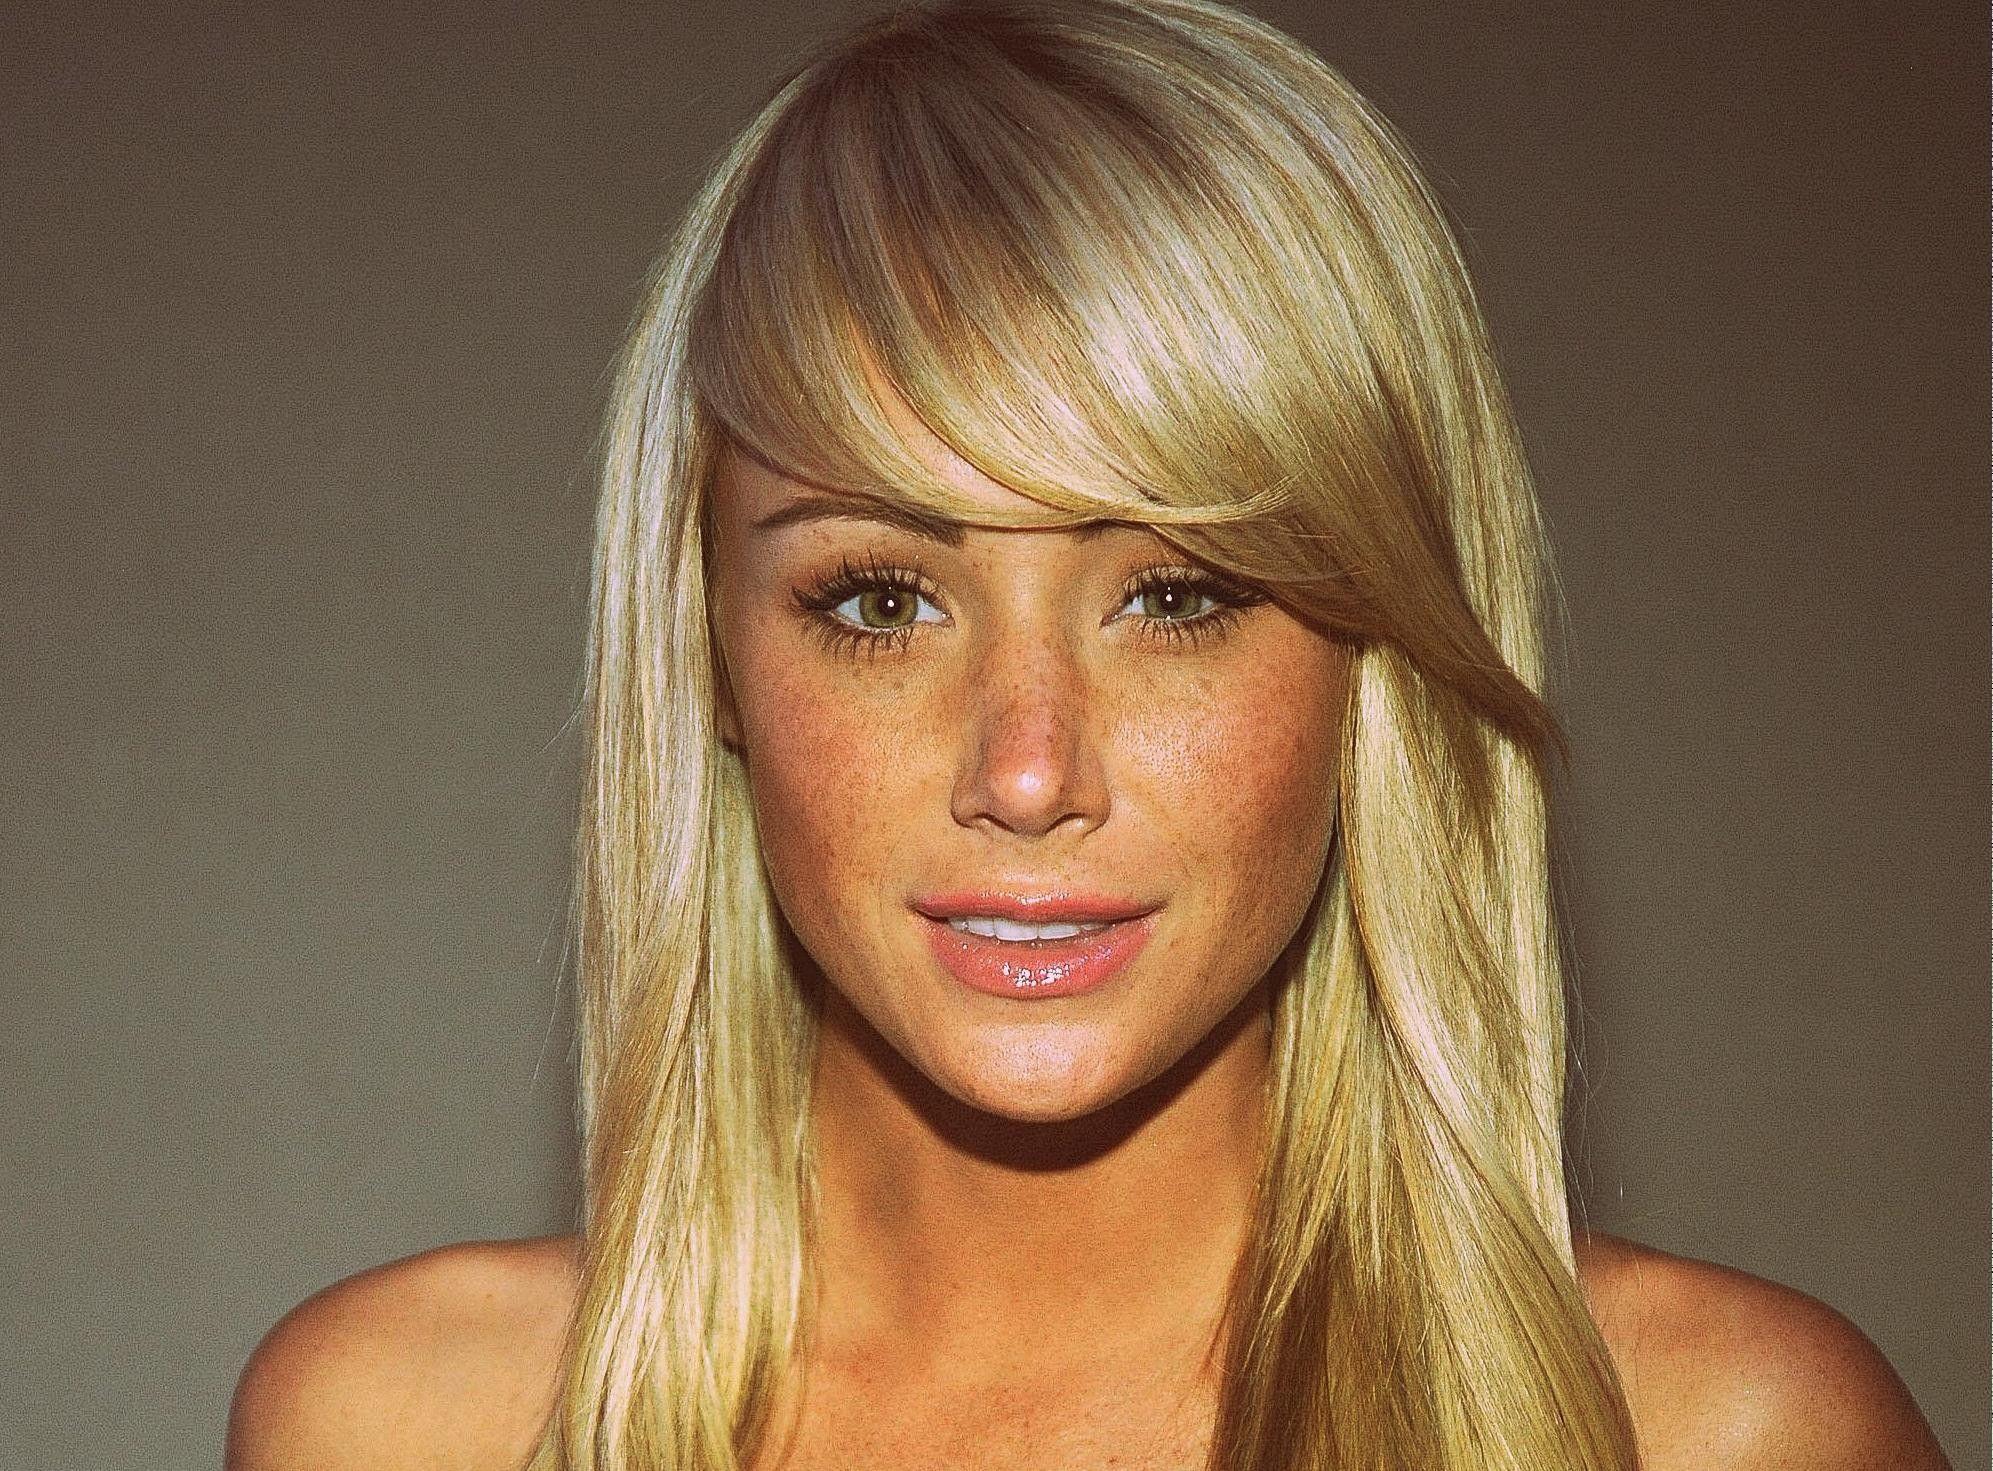 Schräger pony googlesuche babes pinterest celebrity beauty